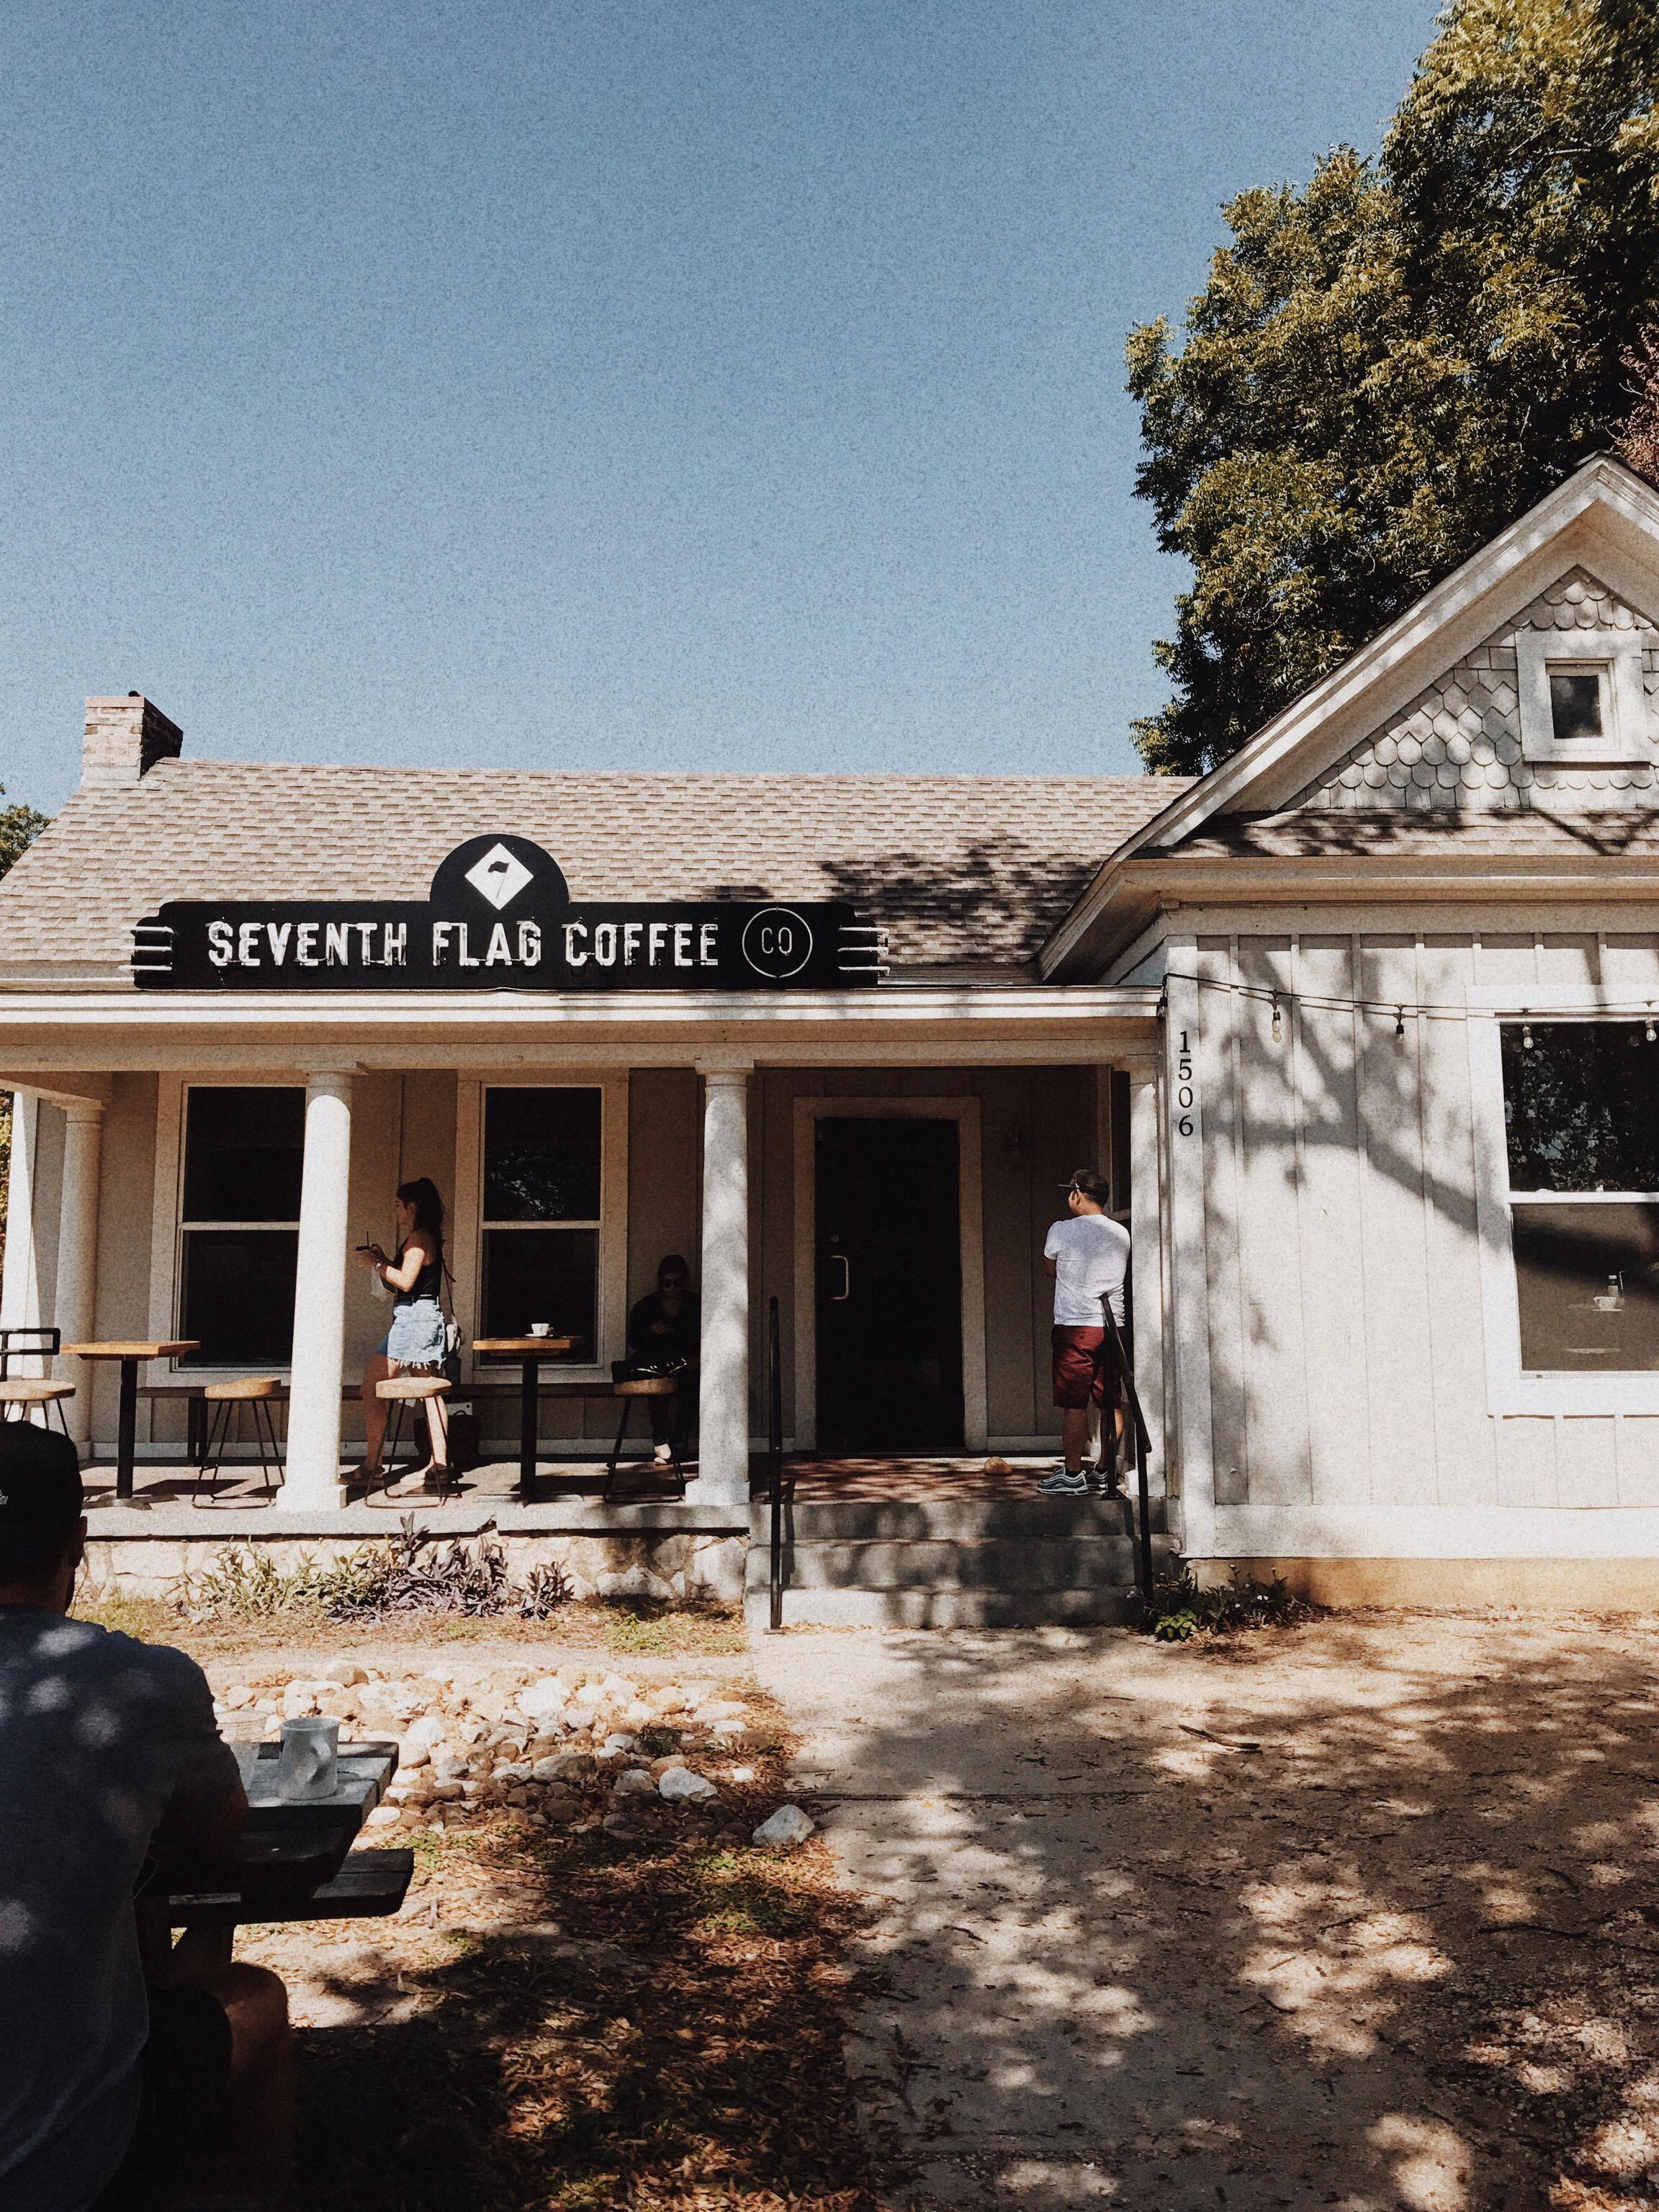 Seventh Flag Coffee